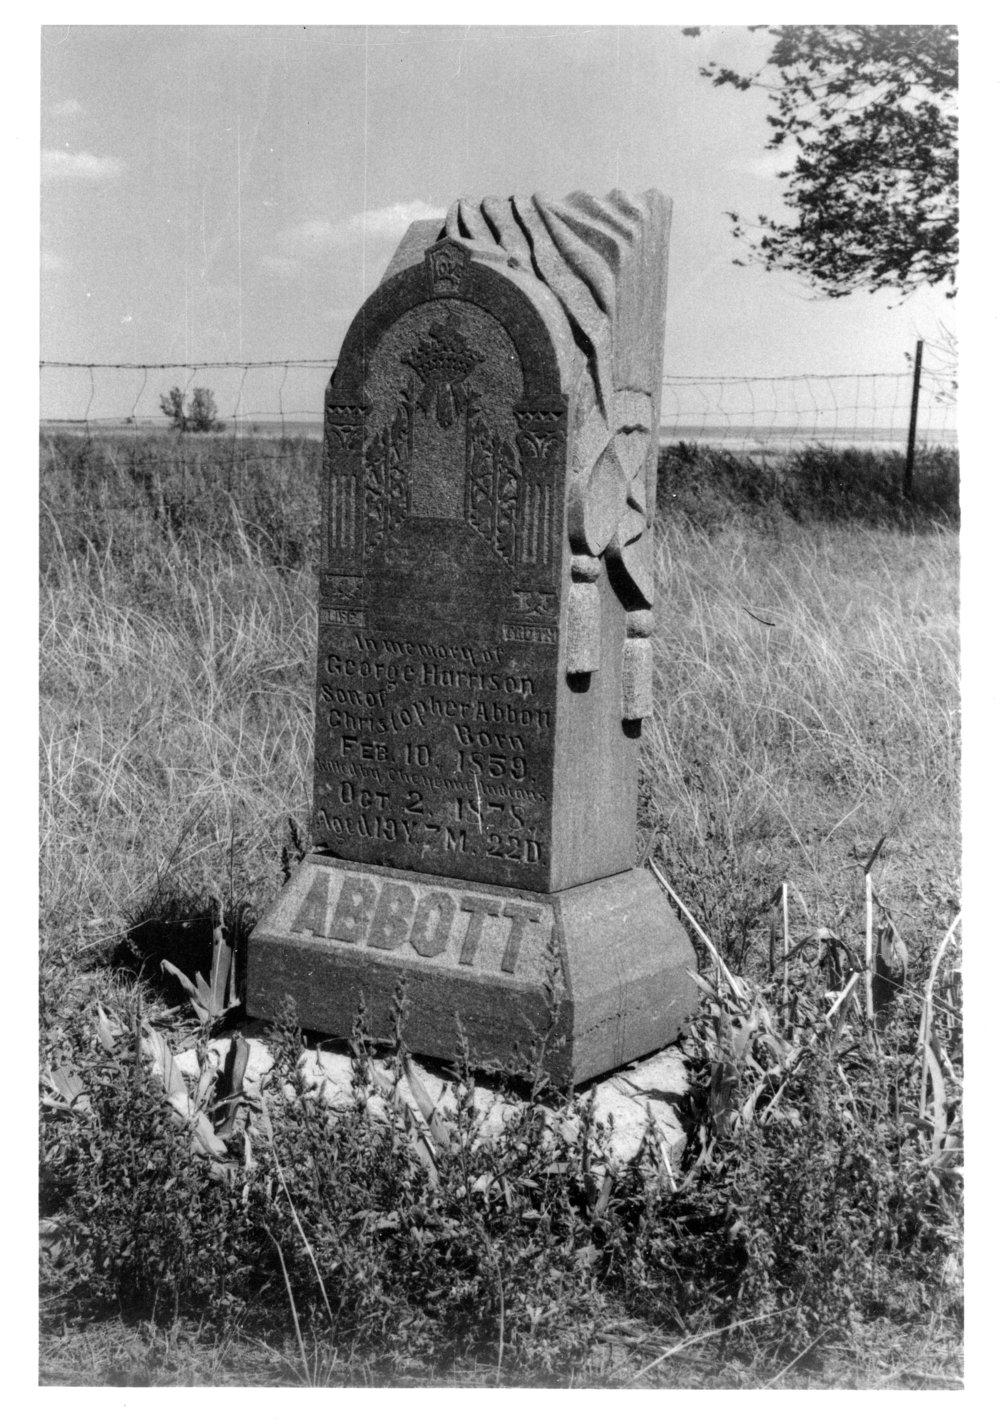 Grave of George Harrison Abbott, Union Cemetery, Herndon, Kansas - 4